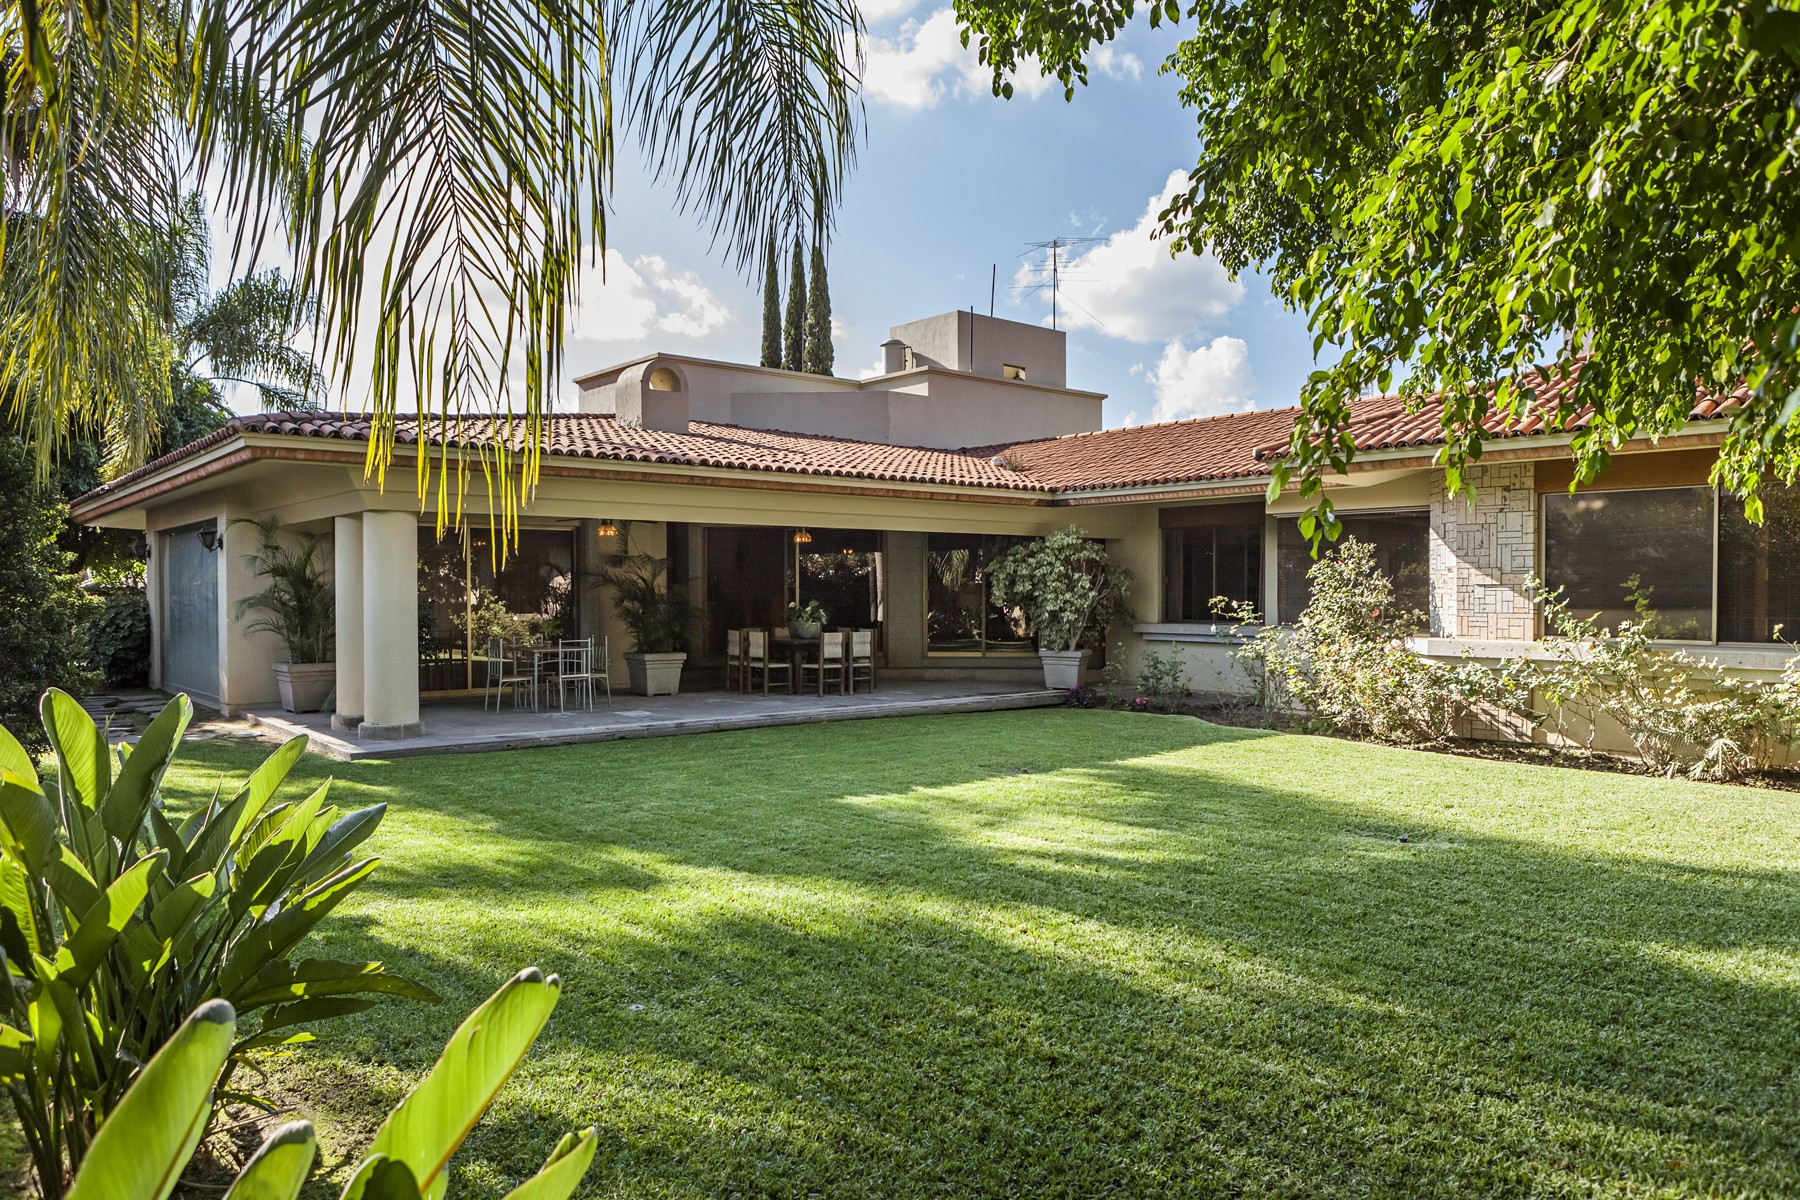 Single Family Home for Sale at Santa Isabel en San Gonzalo, Guadalajara. San Gonzalo Zapopan Zapopan, 45110 Mexico